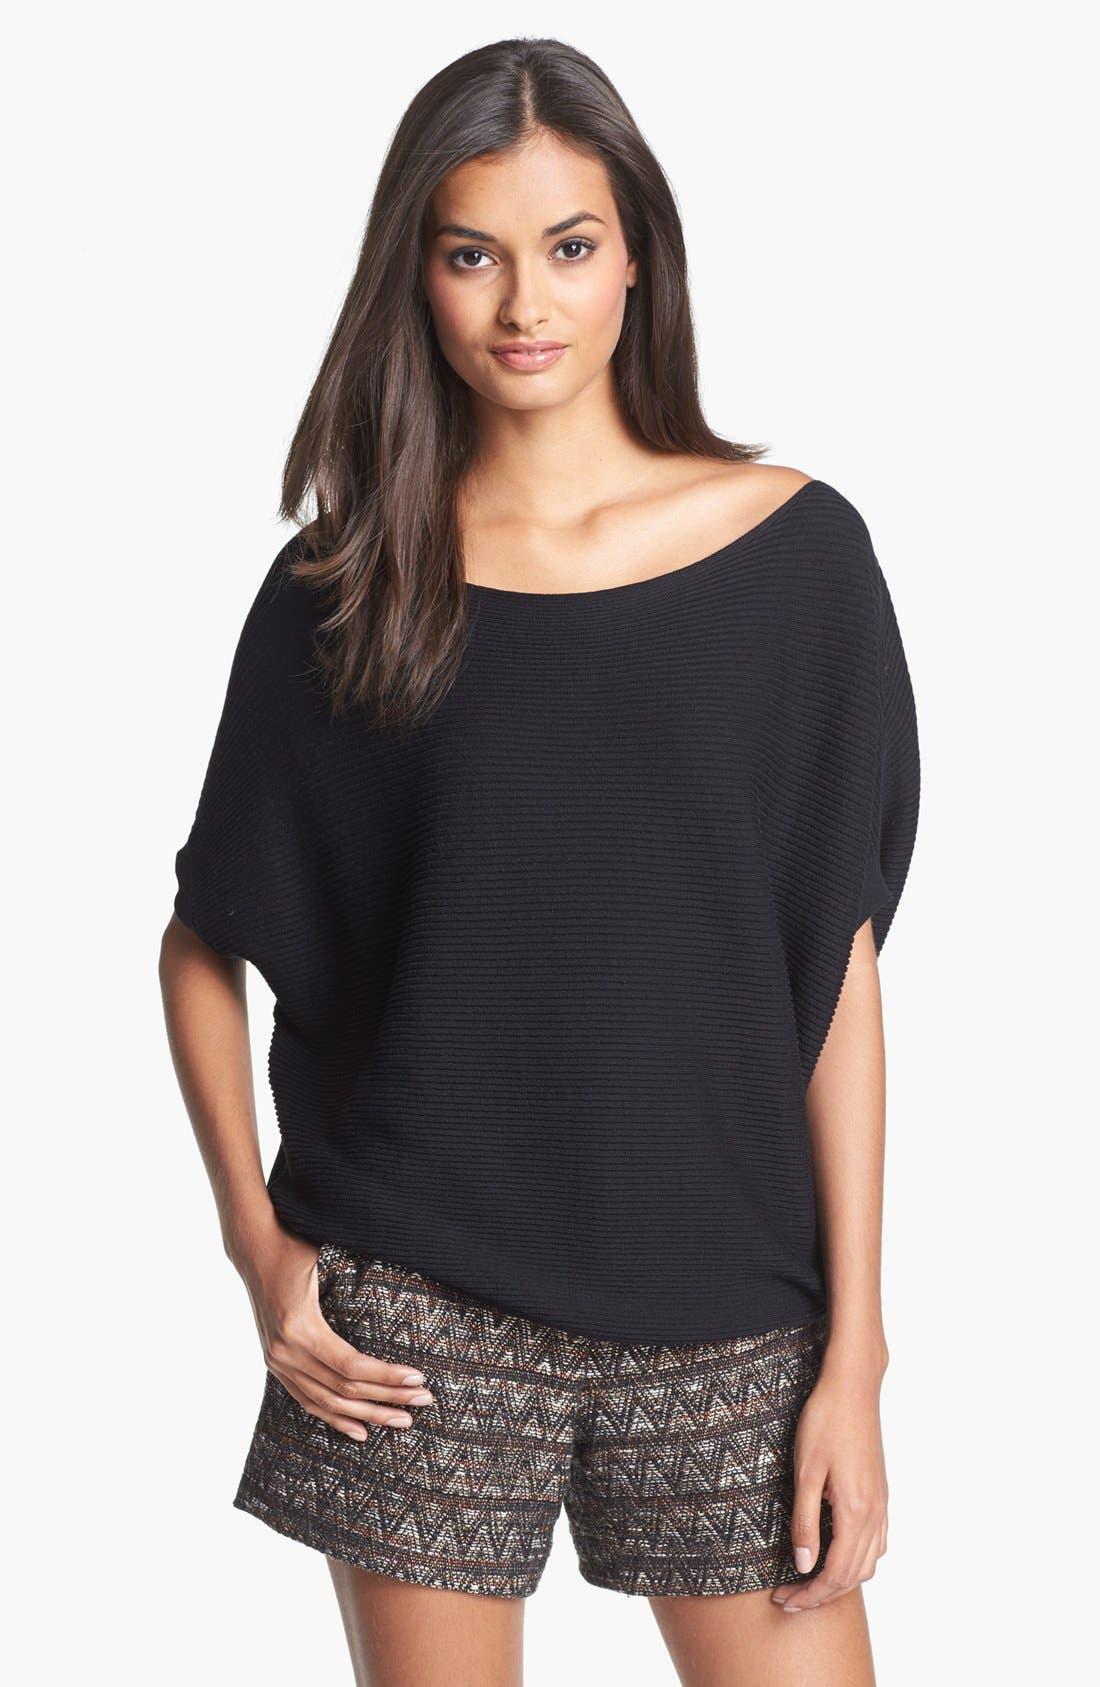 Alternate Image 1 Selected - Trina Turk 'Elianna' Sweater